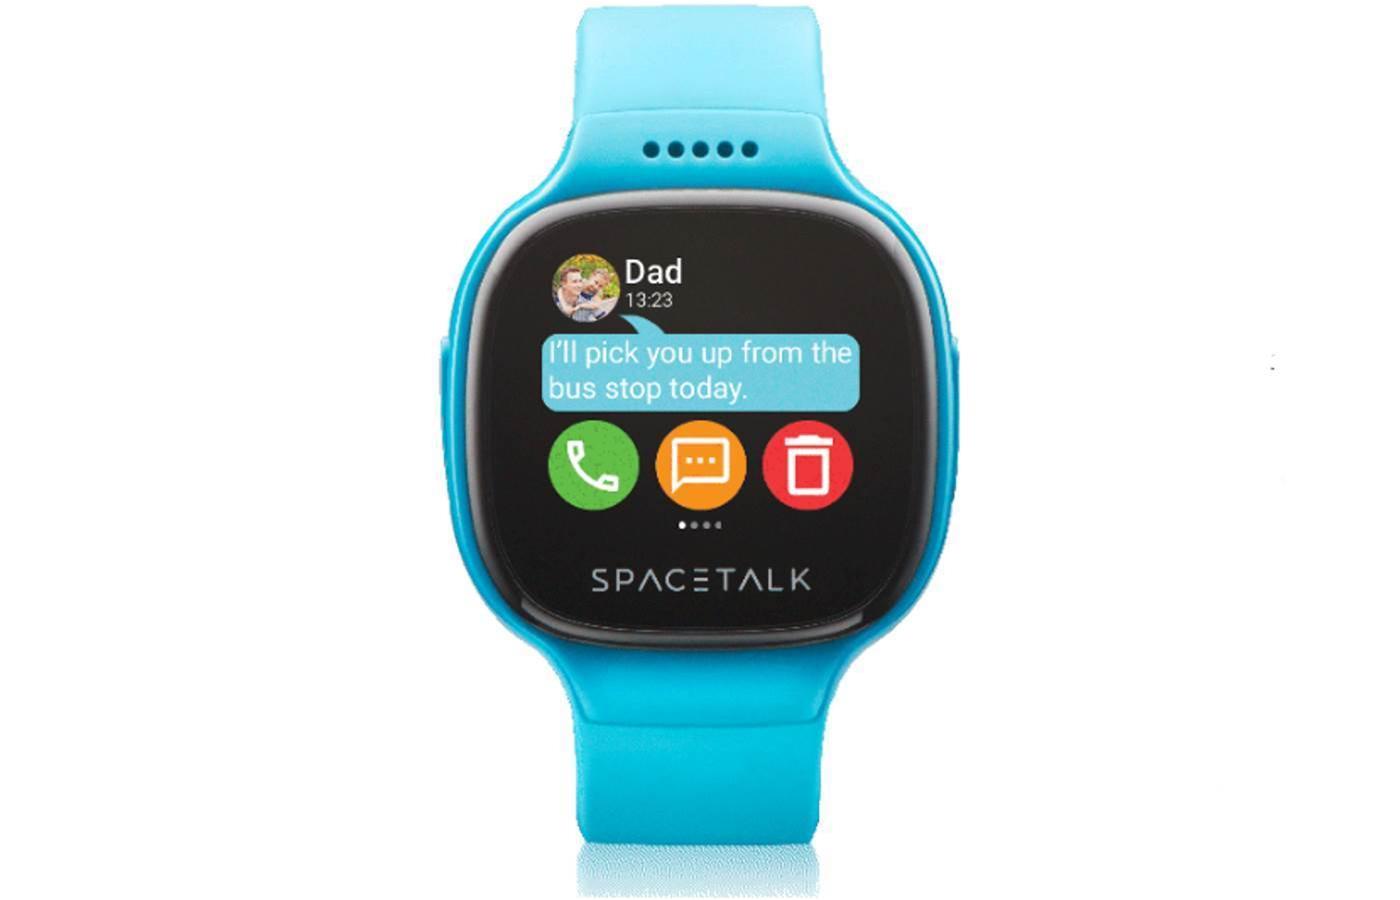 Adelaide Smartwatch Vendor Mgm Wireless Lands Jb Hi Fi Trial